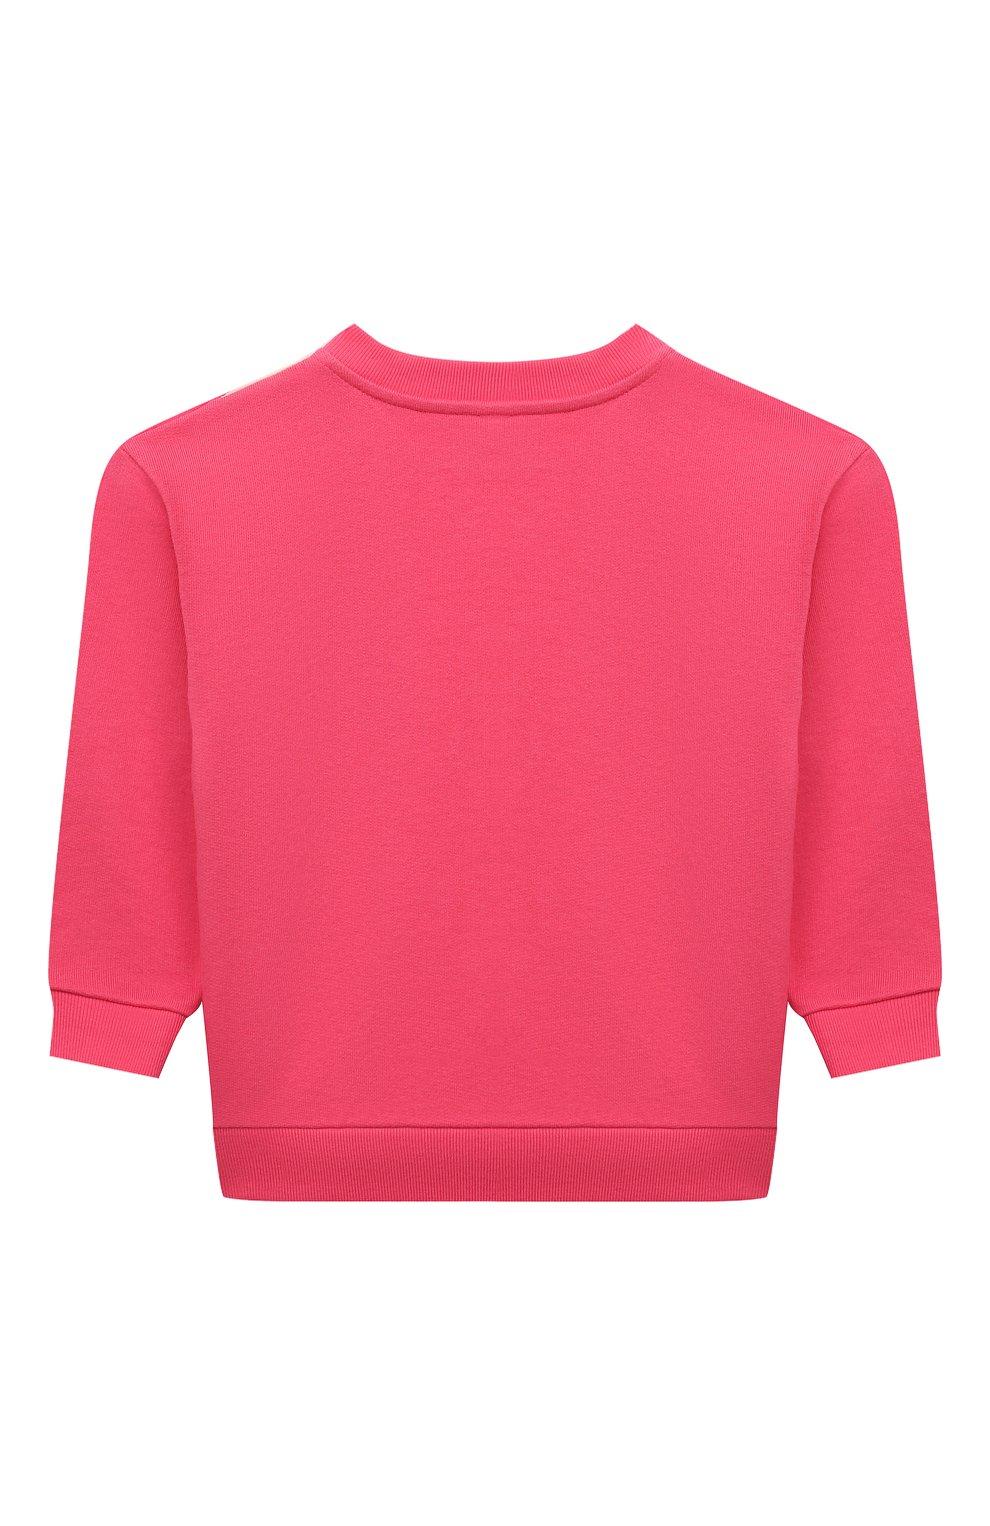 Детский хлопковый свитшот GUCCI розового цвета, арт. 629430/XJC7C | Фото 2